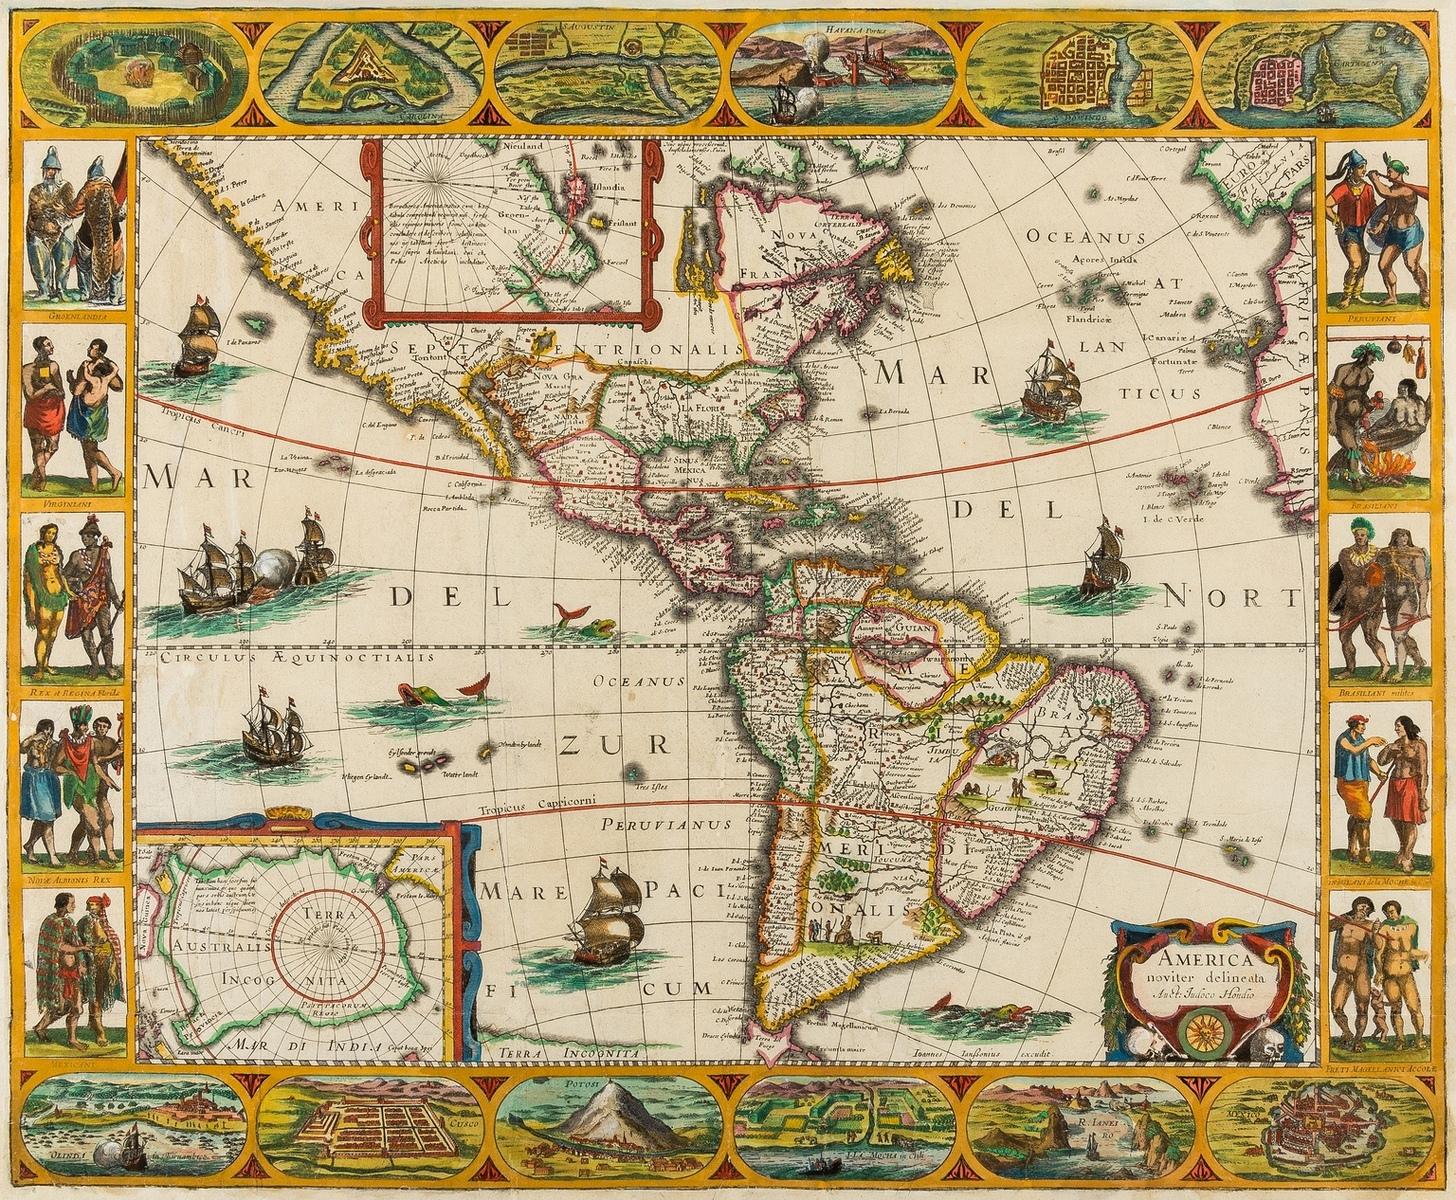 America.- Jansson (Jan) and Jodocus Hondius. America noviter delineata, [circa 1623-1632].